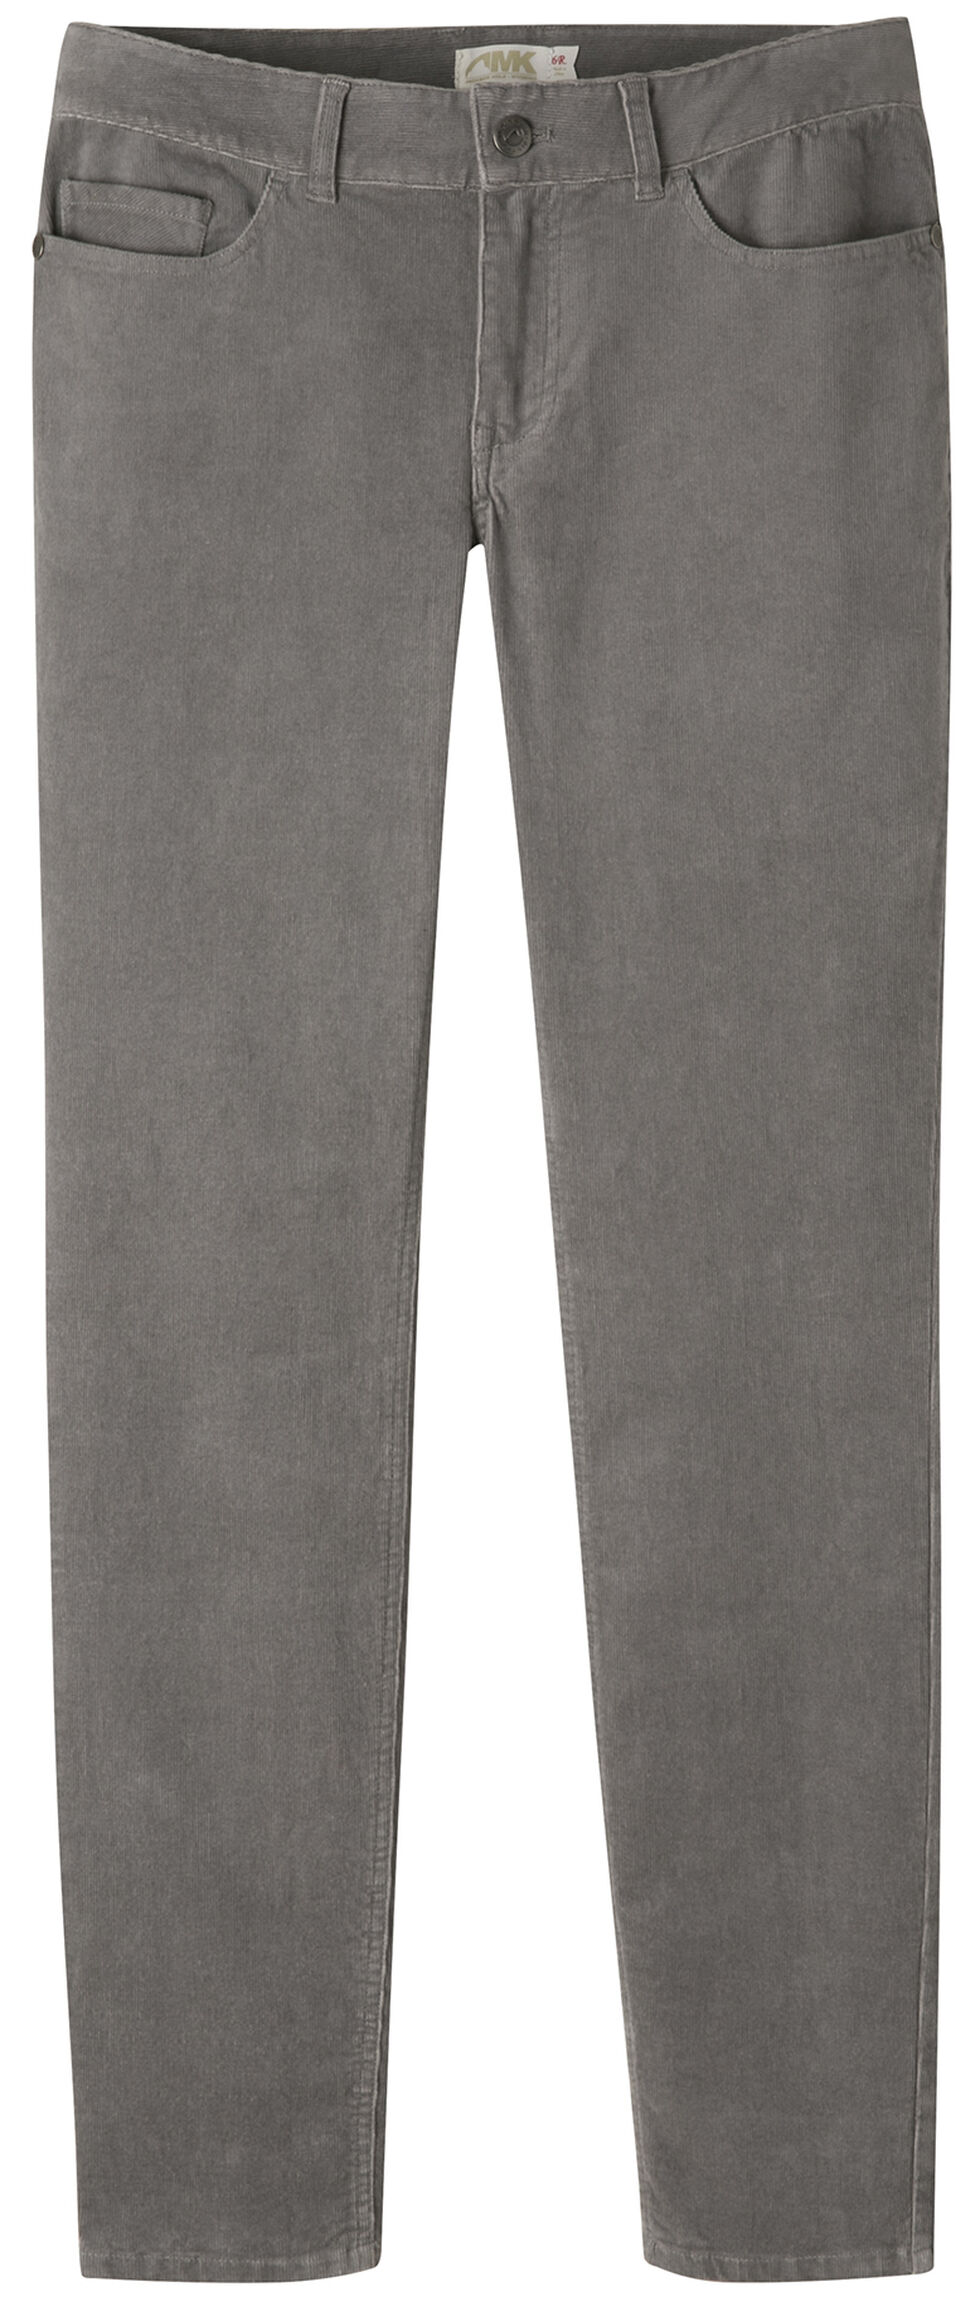 Mountain Khakis Women's Canyon Cord Slim Fit Skinny Pants, Dark Grey, hi-res